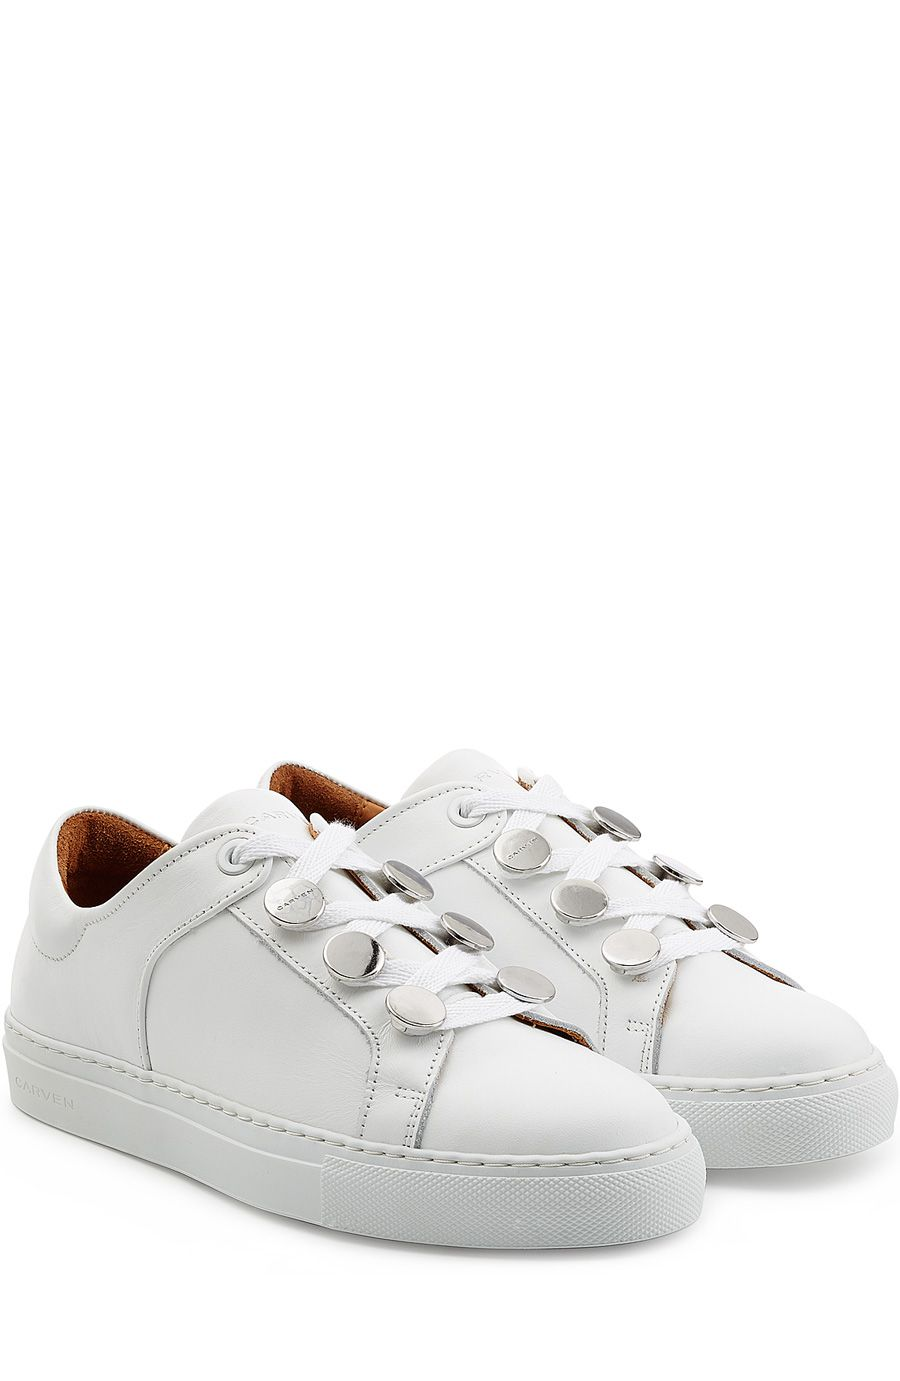 Leder-Sneakers detail 0